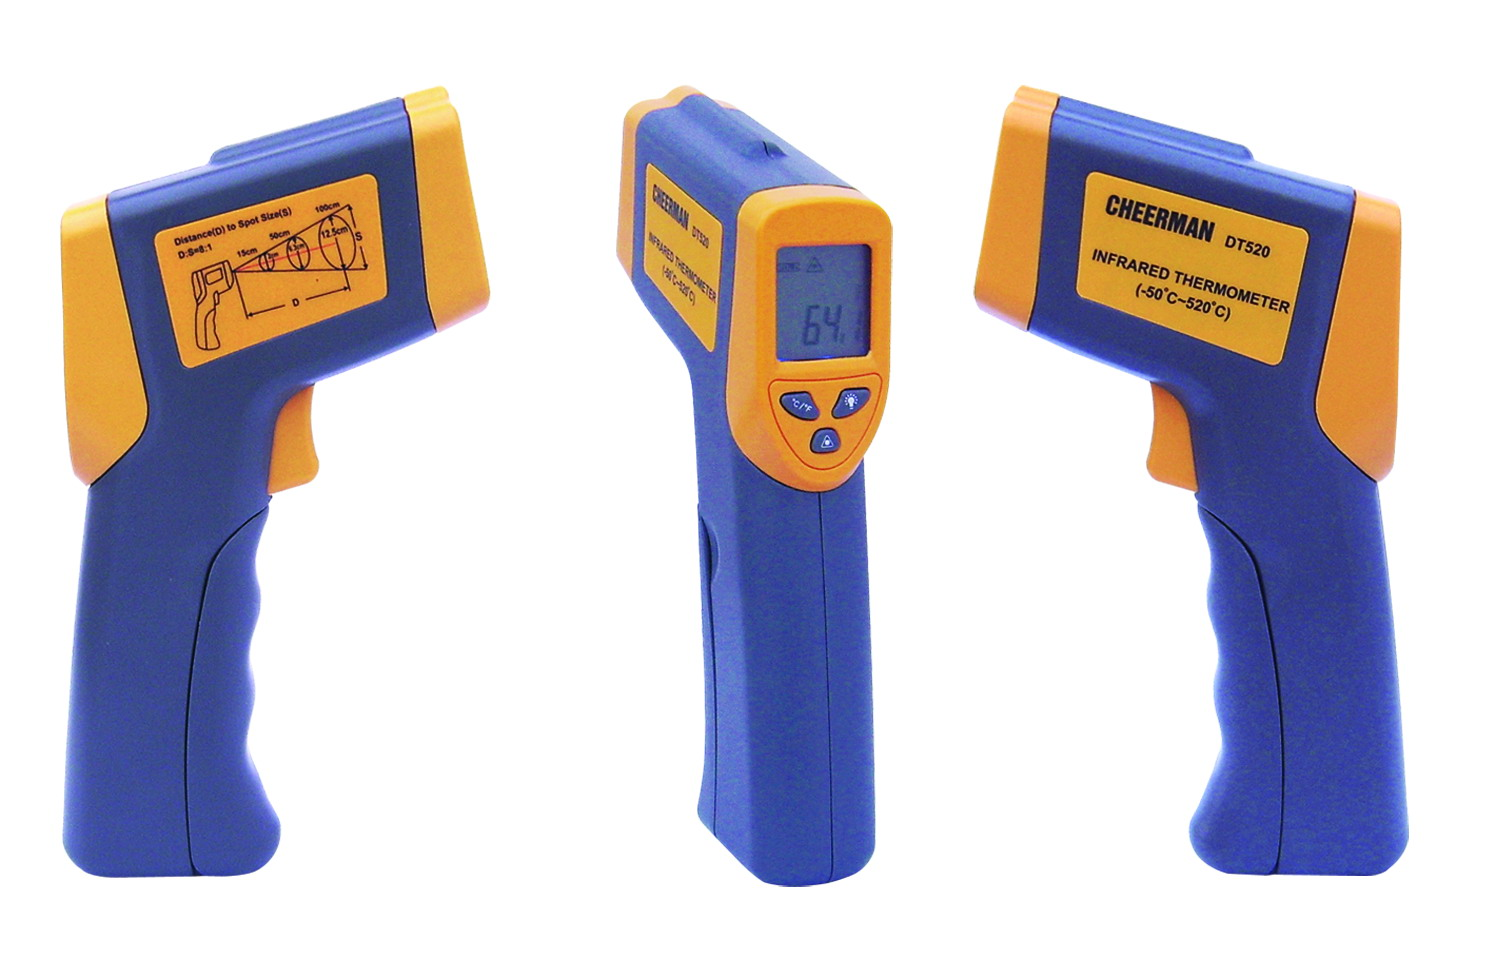 Infrared Thermometers อินฟราเรดเทอร์โมมิเตอร์ DT520